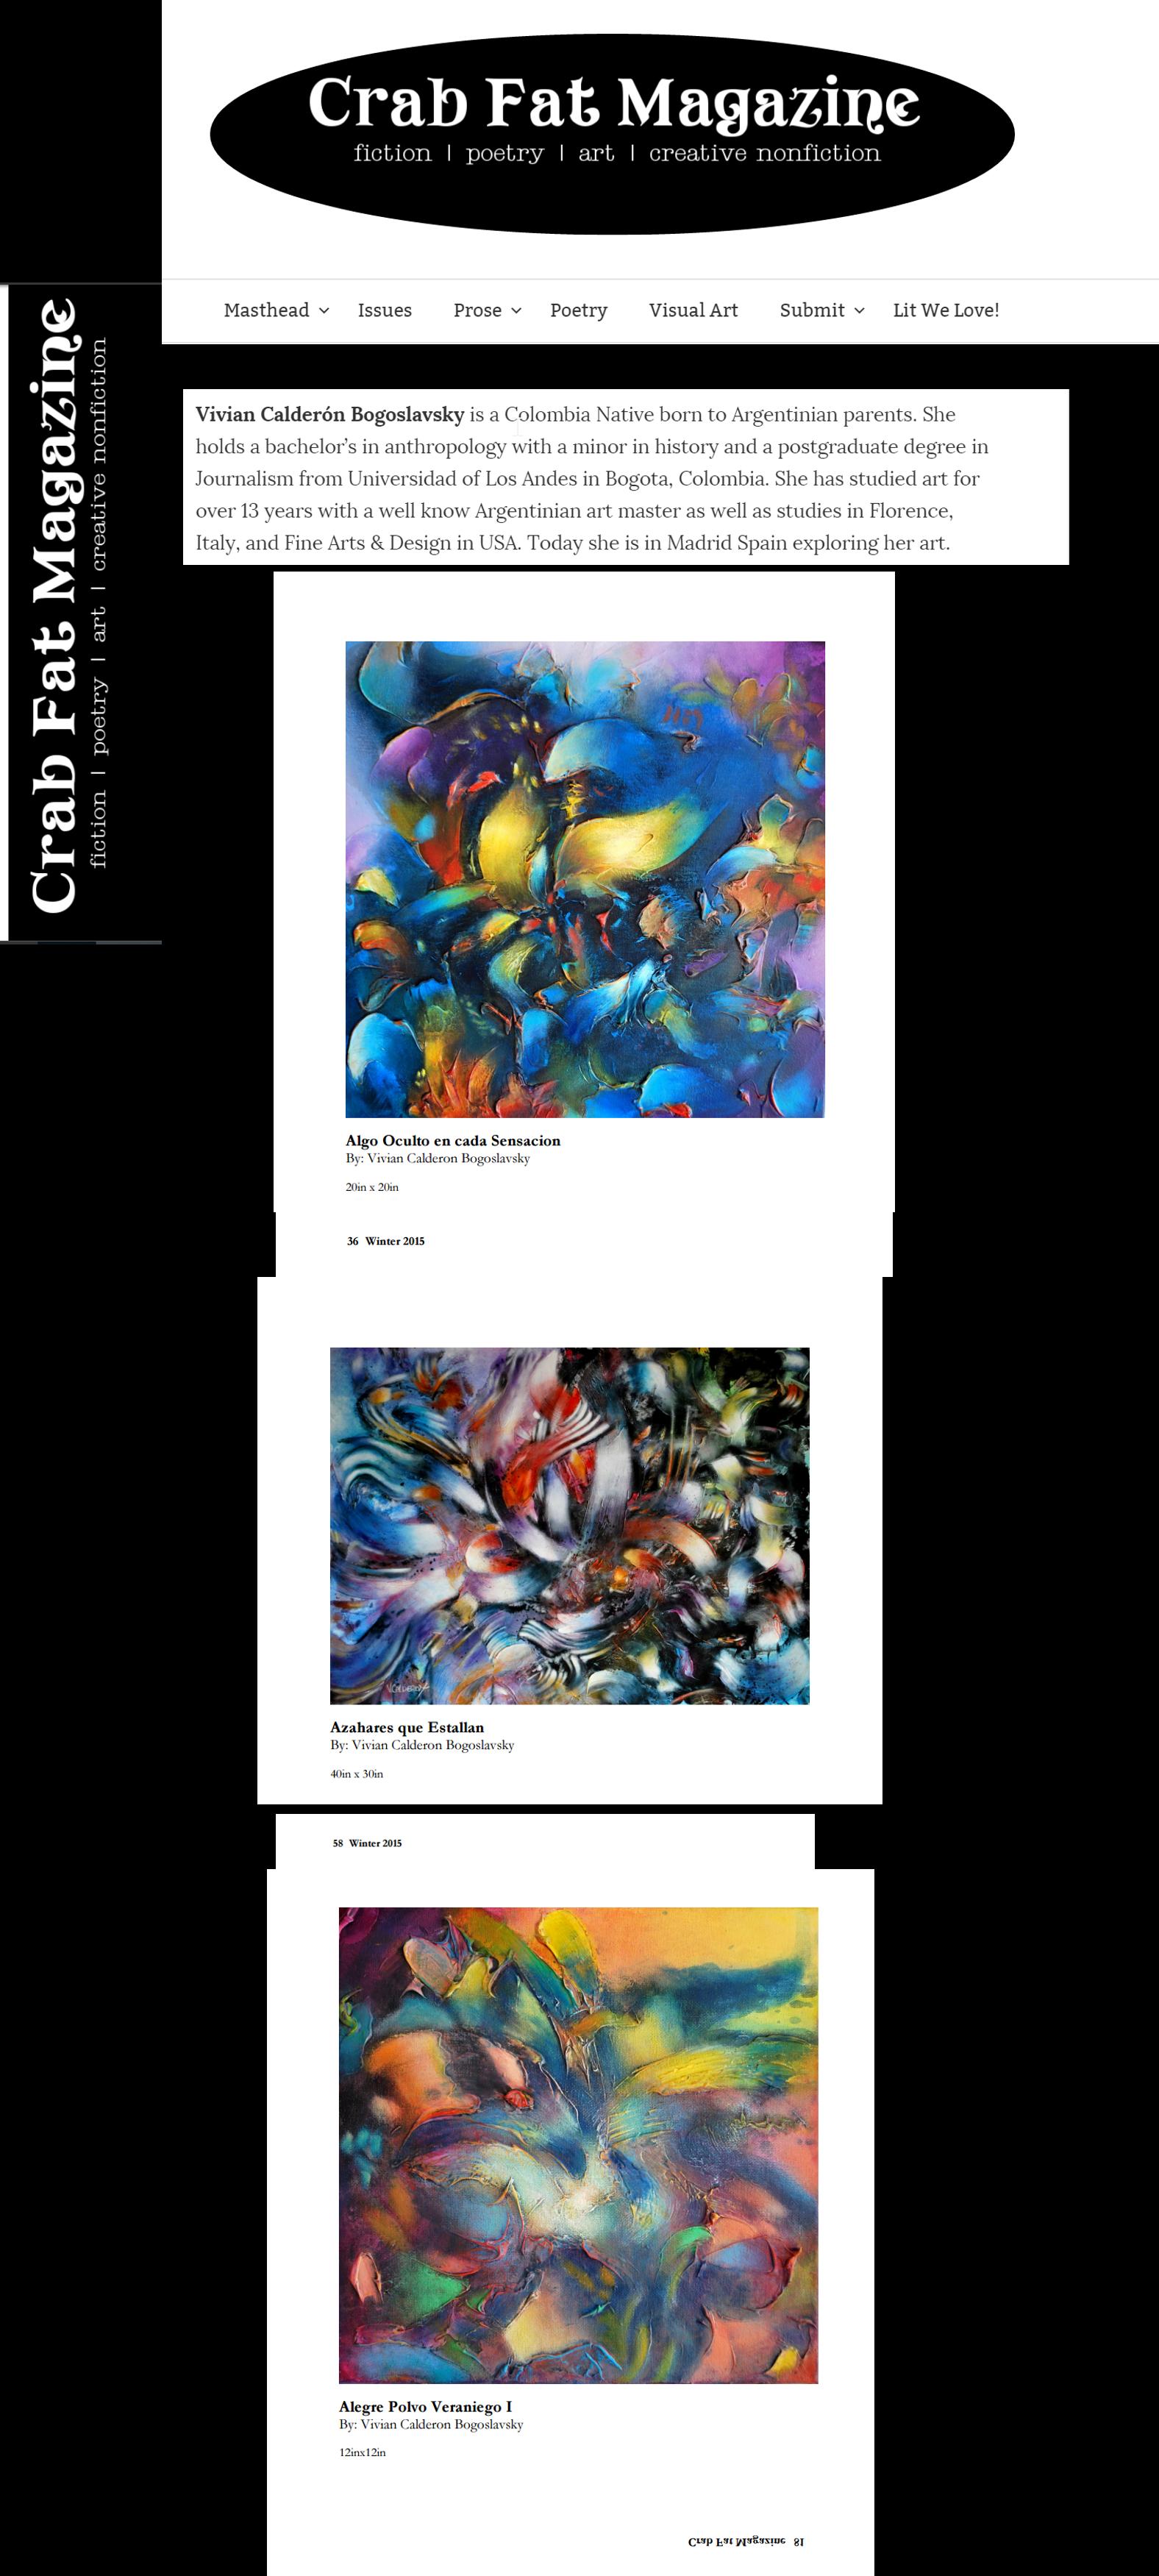 http://crabfatmagazine.com/wp-content/uploads/2015/11/CFM-Issue-6.pdf